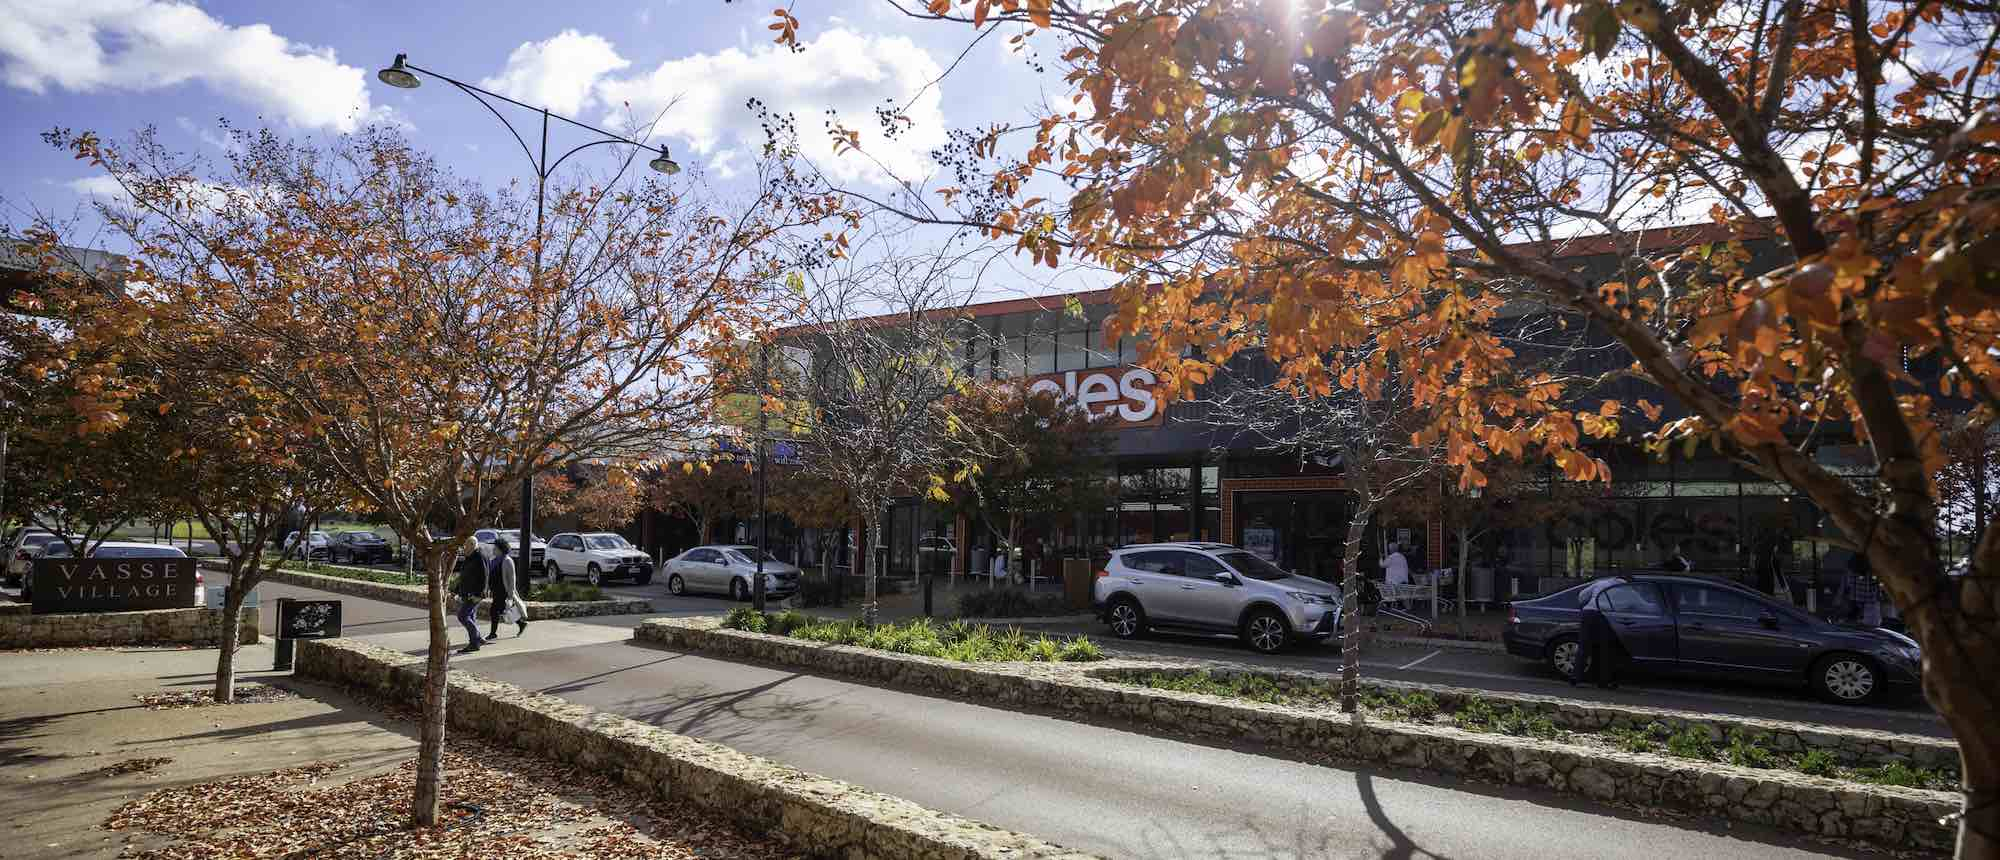 vasse-village-coles-streetview-shops-autumn-trees